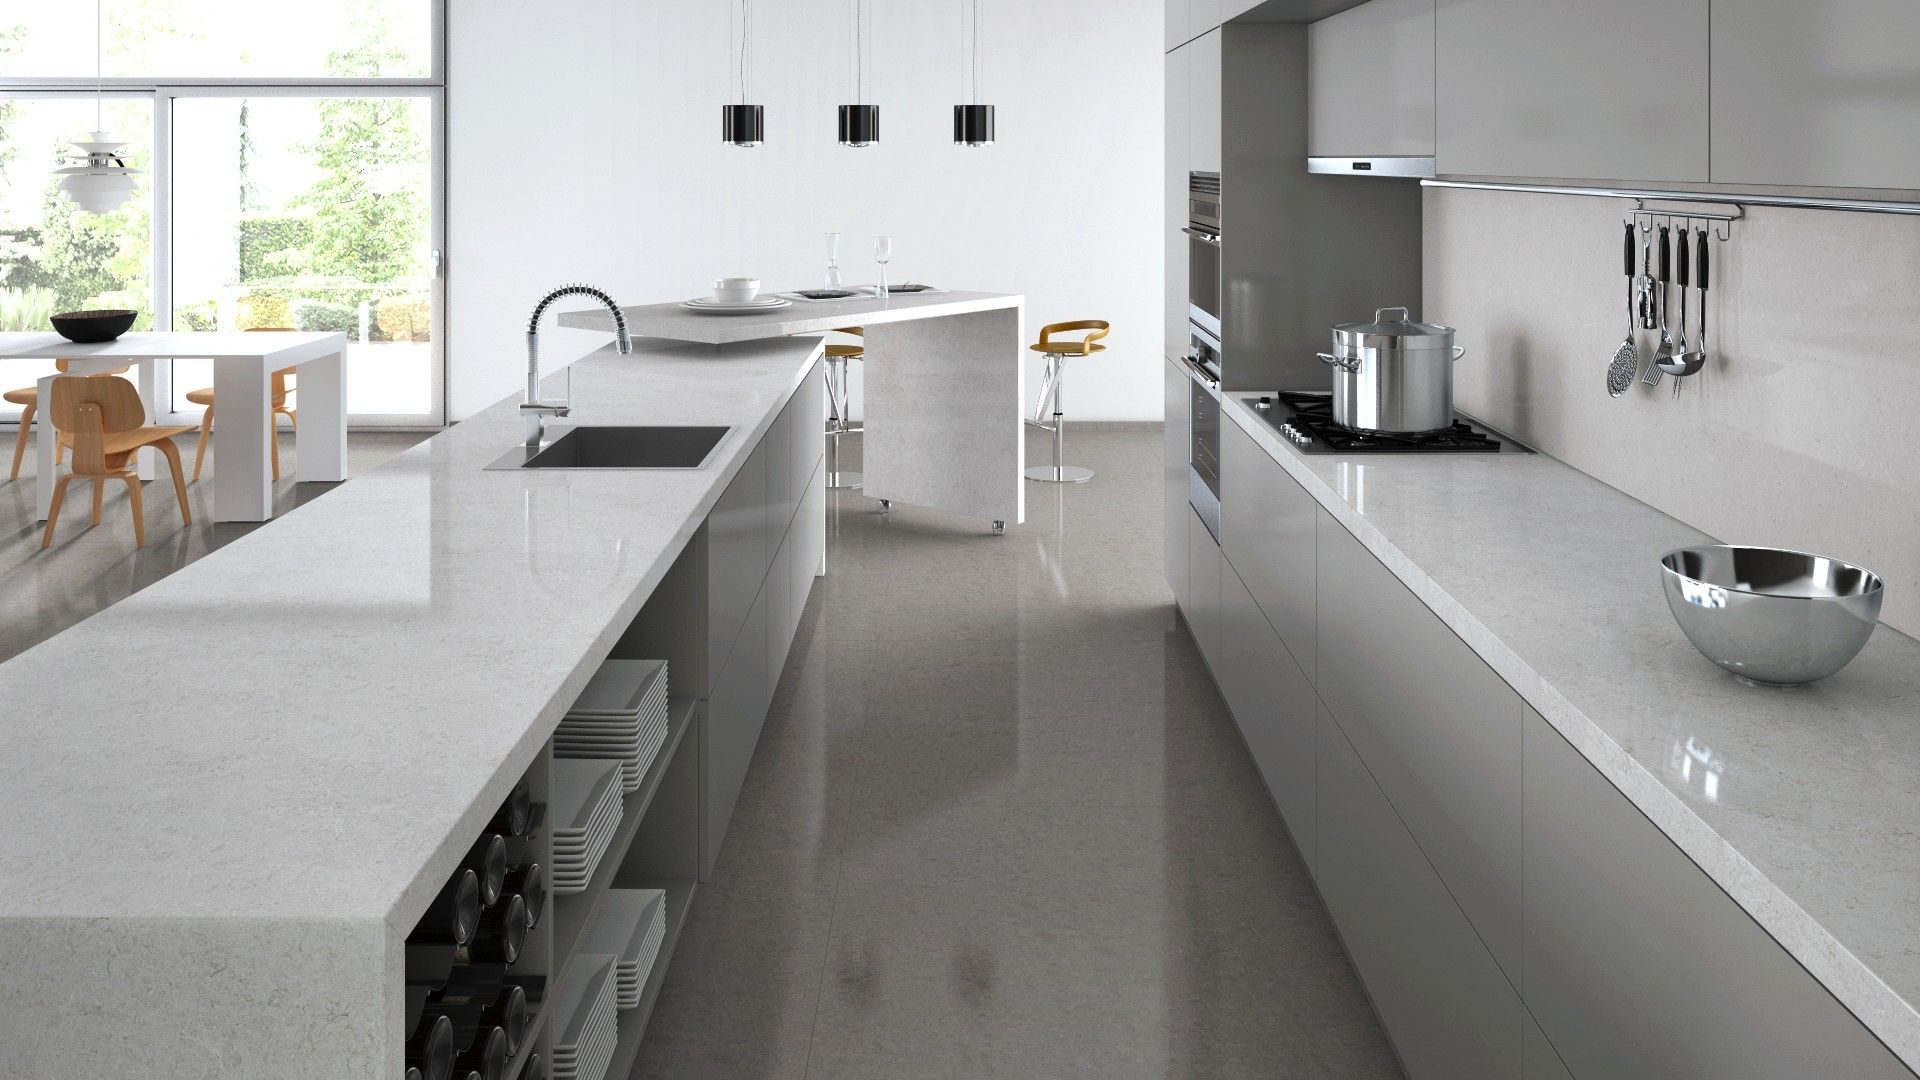 Caesarstone Visualizer Light Grey Cabinets And Bianco Drift Stone Bench Tops Kitchen Kitchen Flooring Kitchen Kitchen Design Software